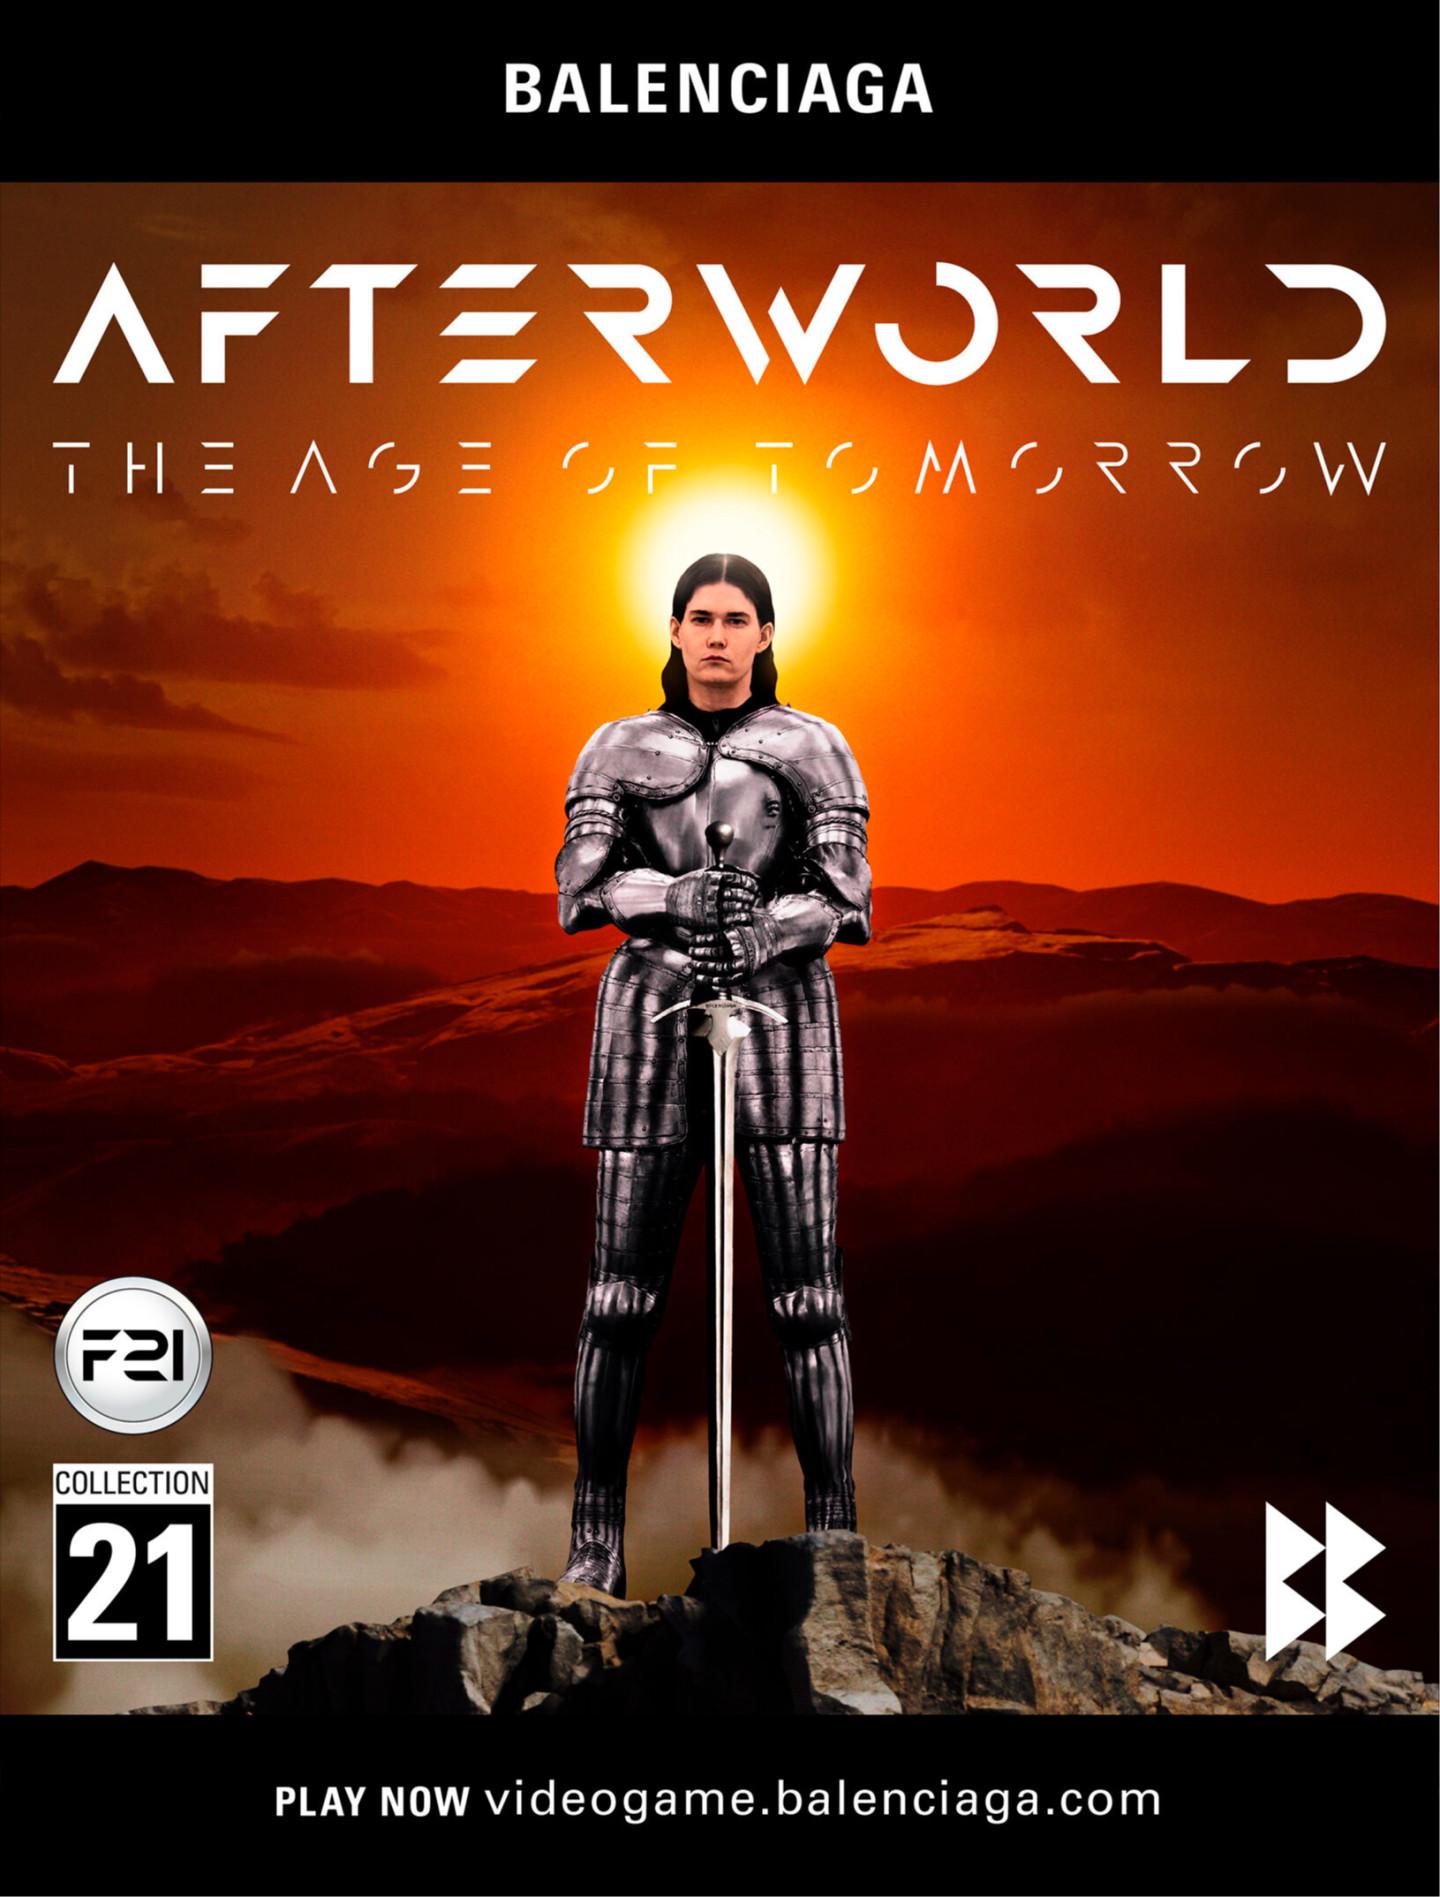 Обложка видеоигры«Afterworld: The Age of Tomorrow» от Balenciaga